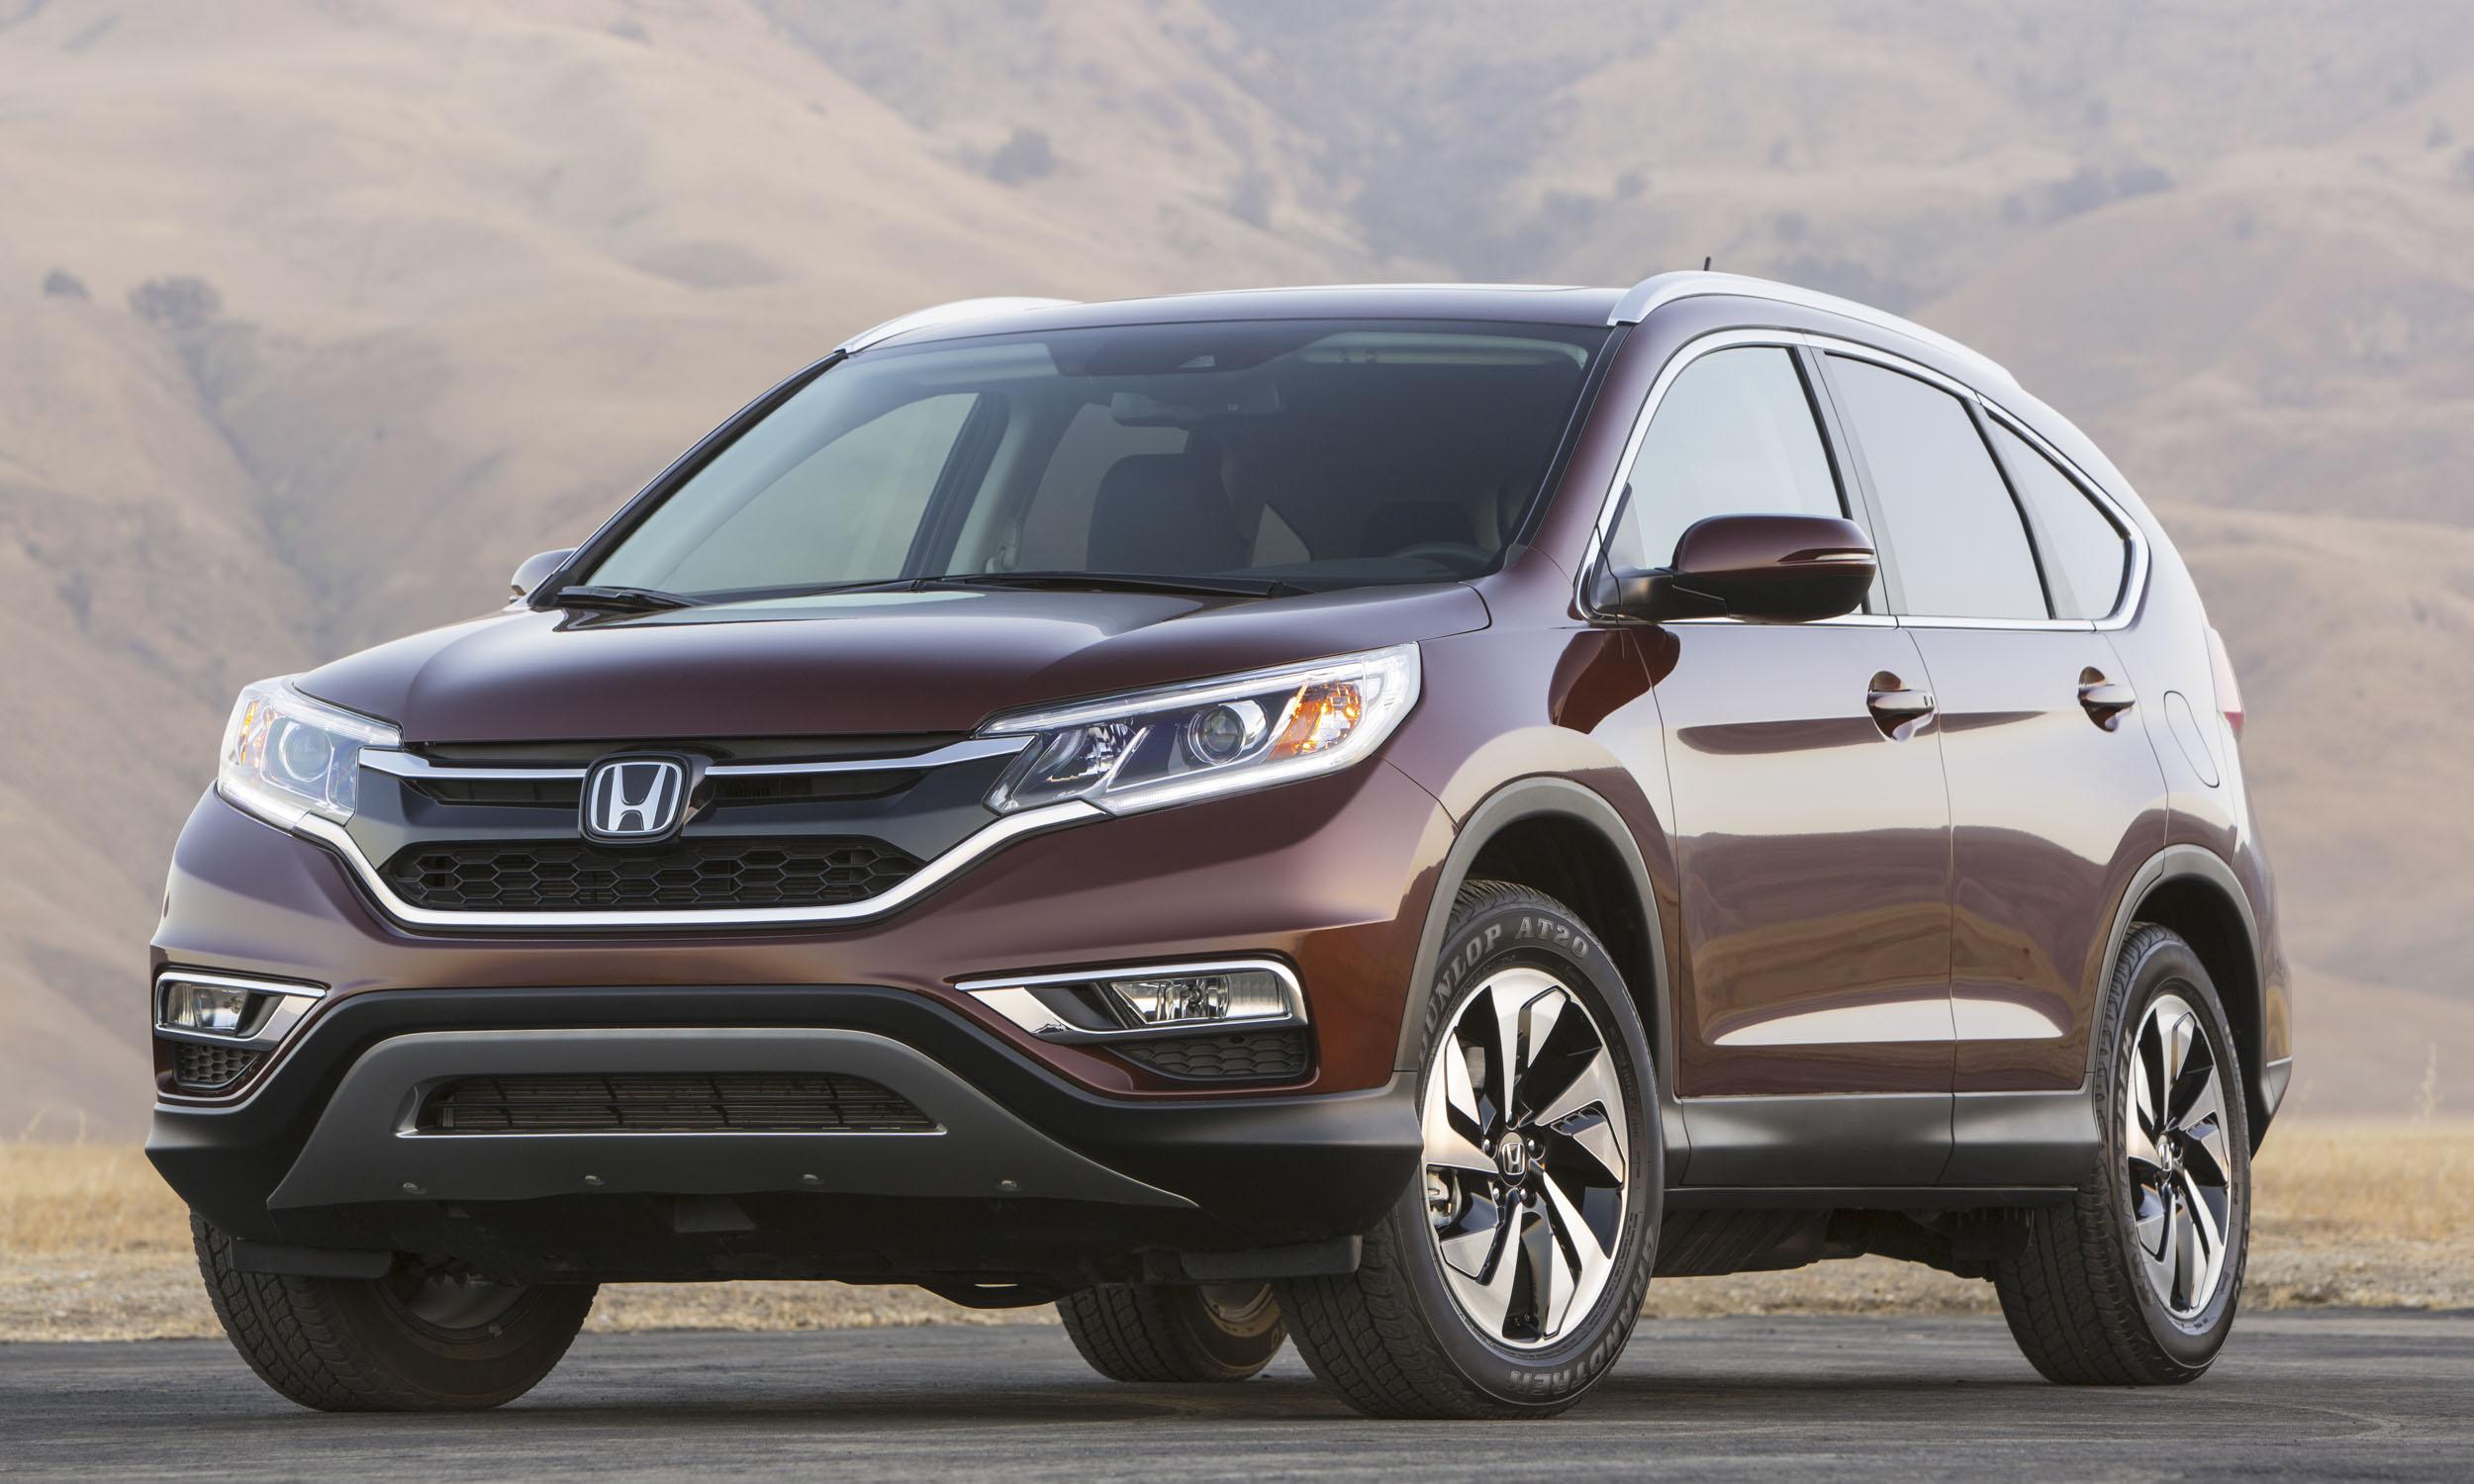 © American Honda Motor Company